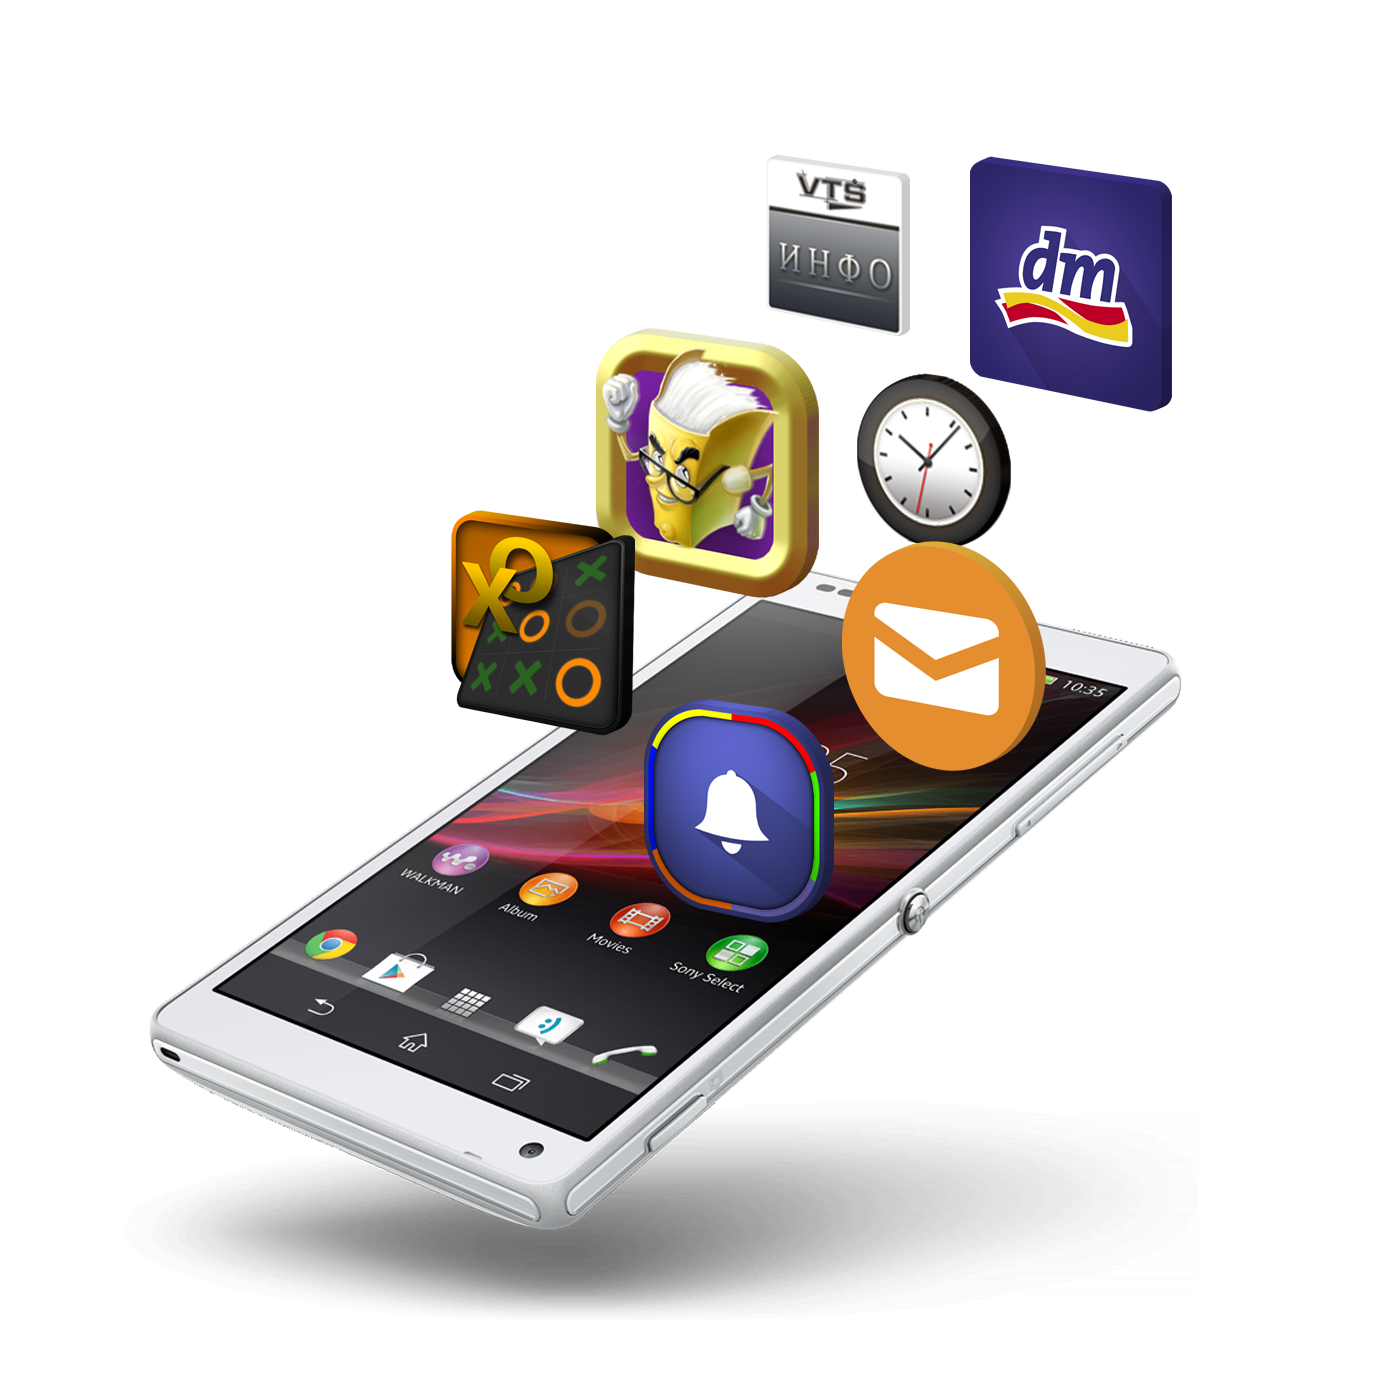 Kernel lab - Android aplikacjije